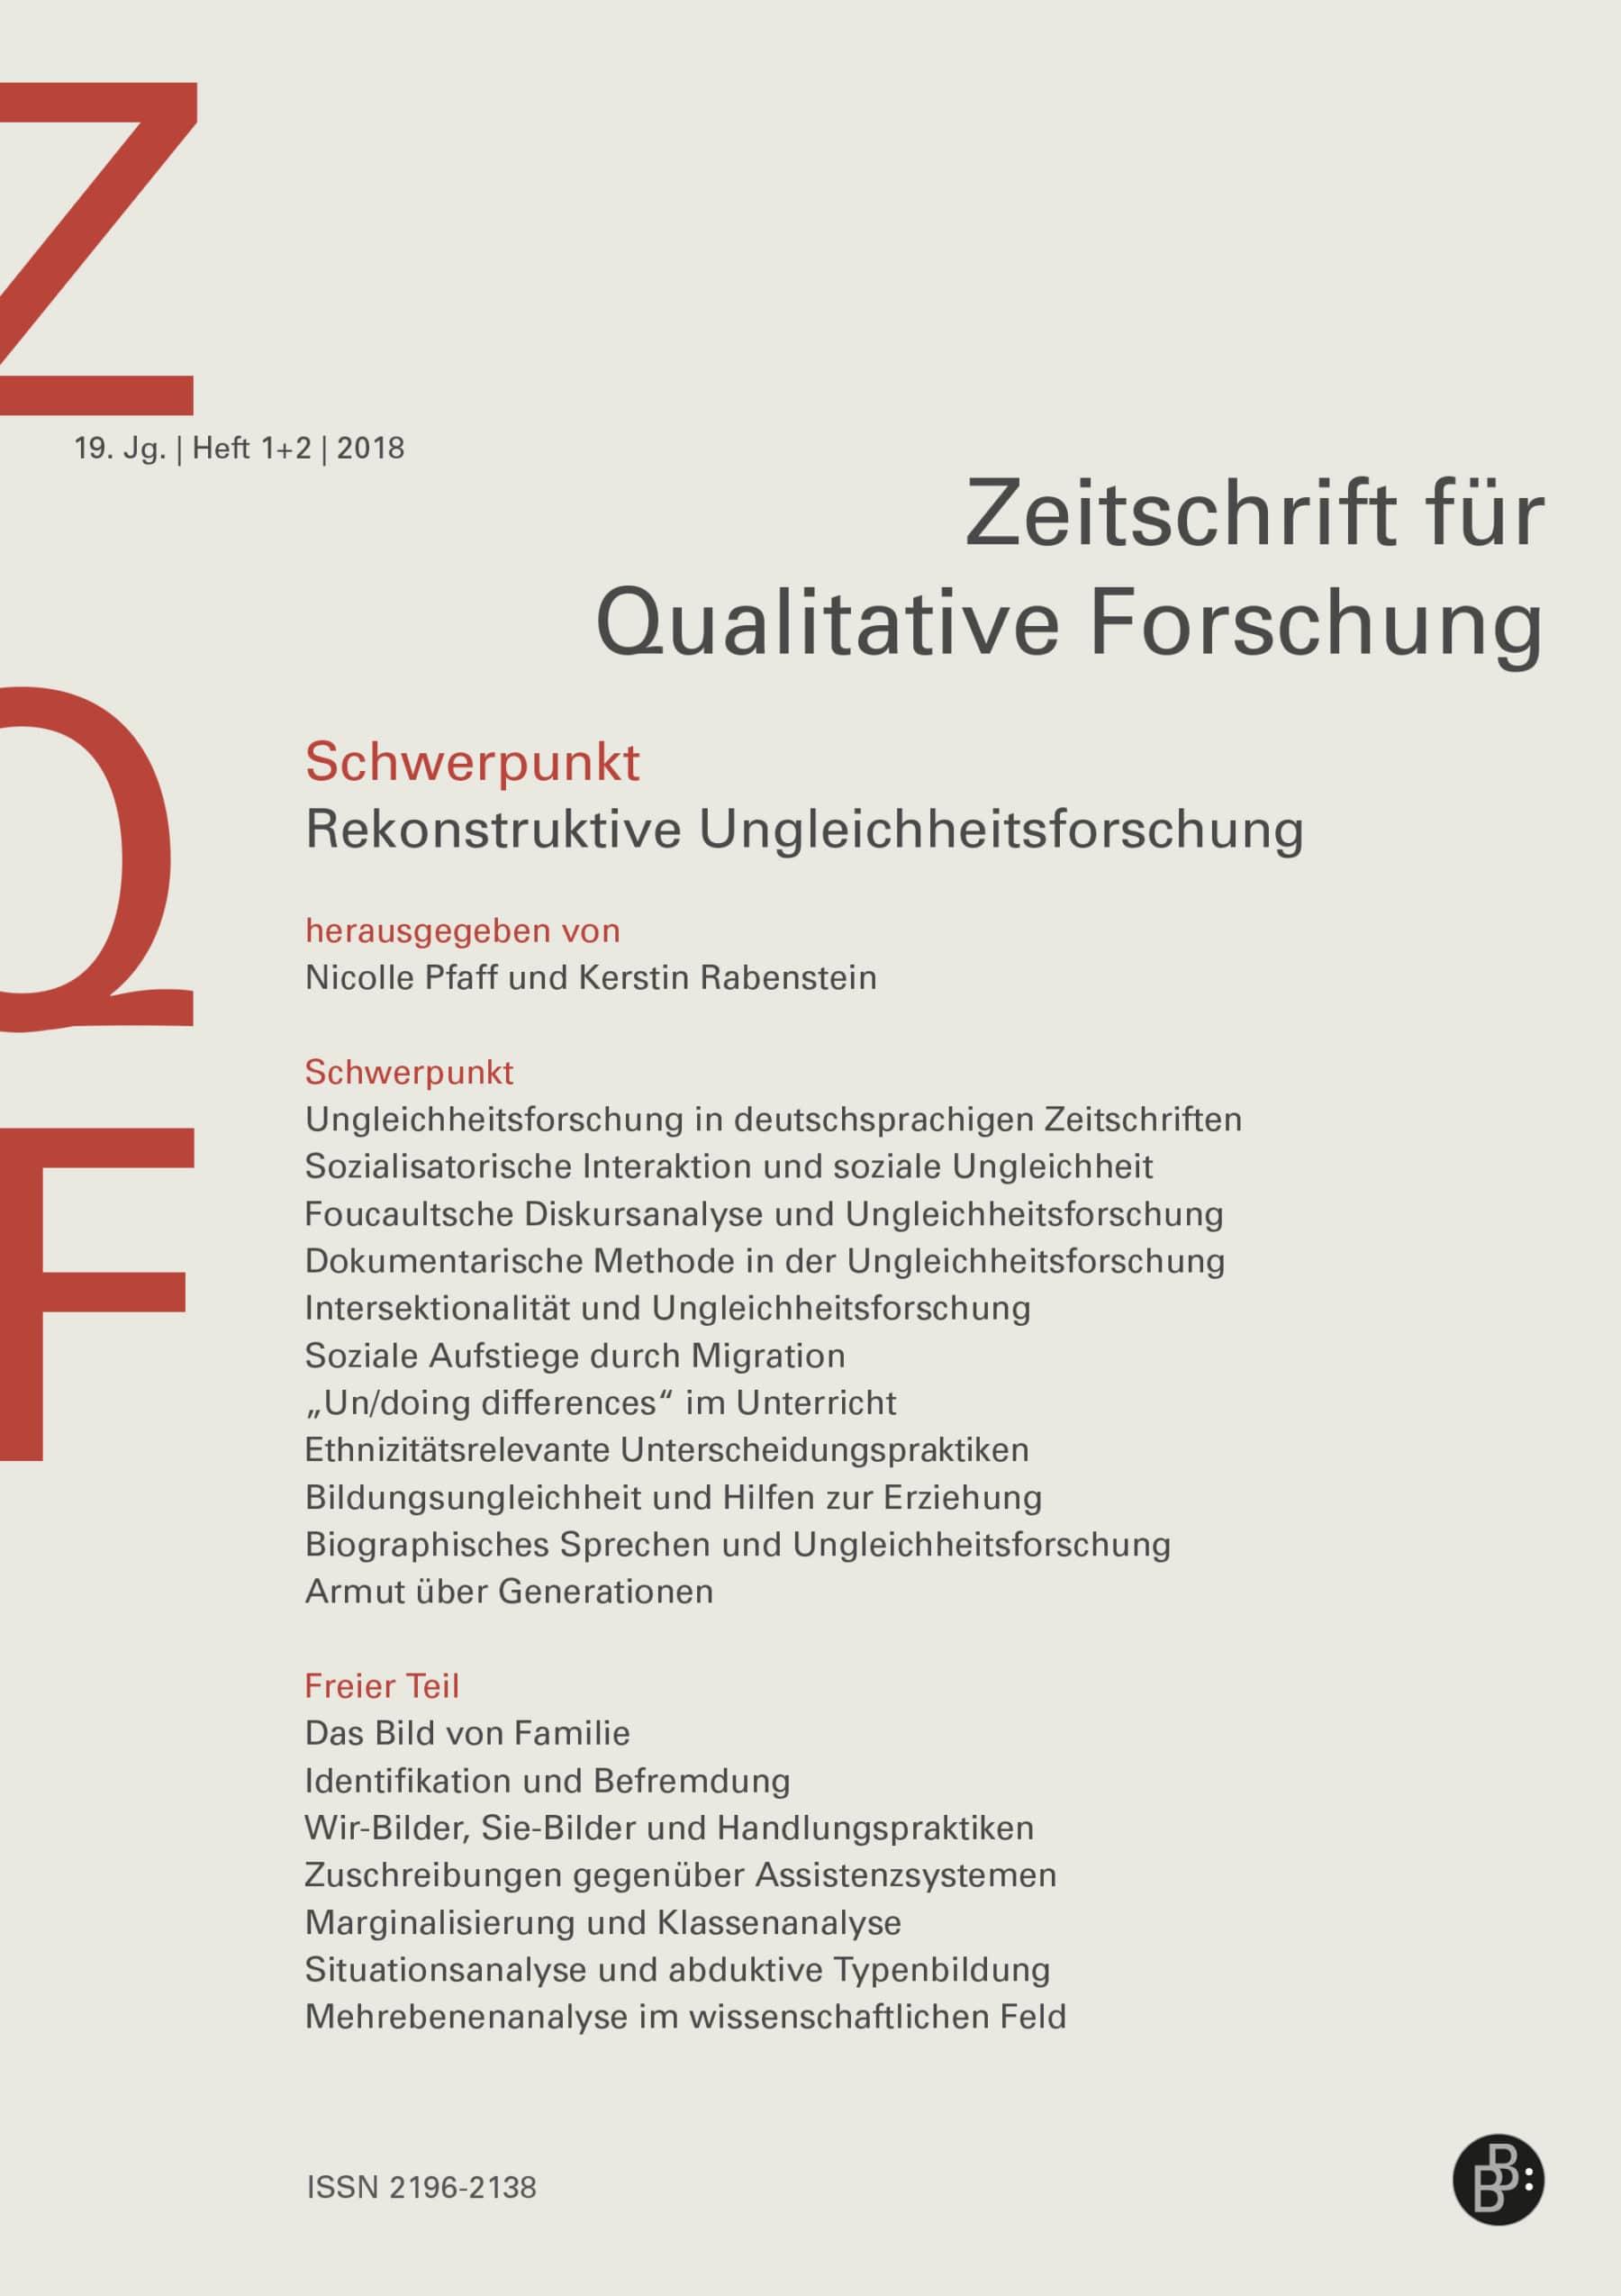 ZQF – Zeitschrift für Qualitative Forschung 1+2-2018: Rekonstruktive Ungleichheitsforschung